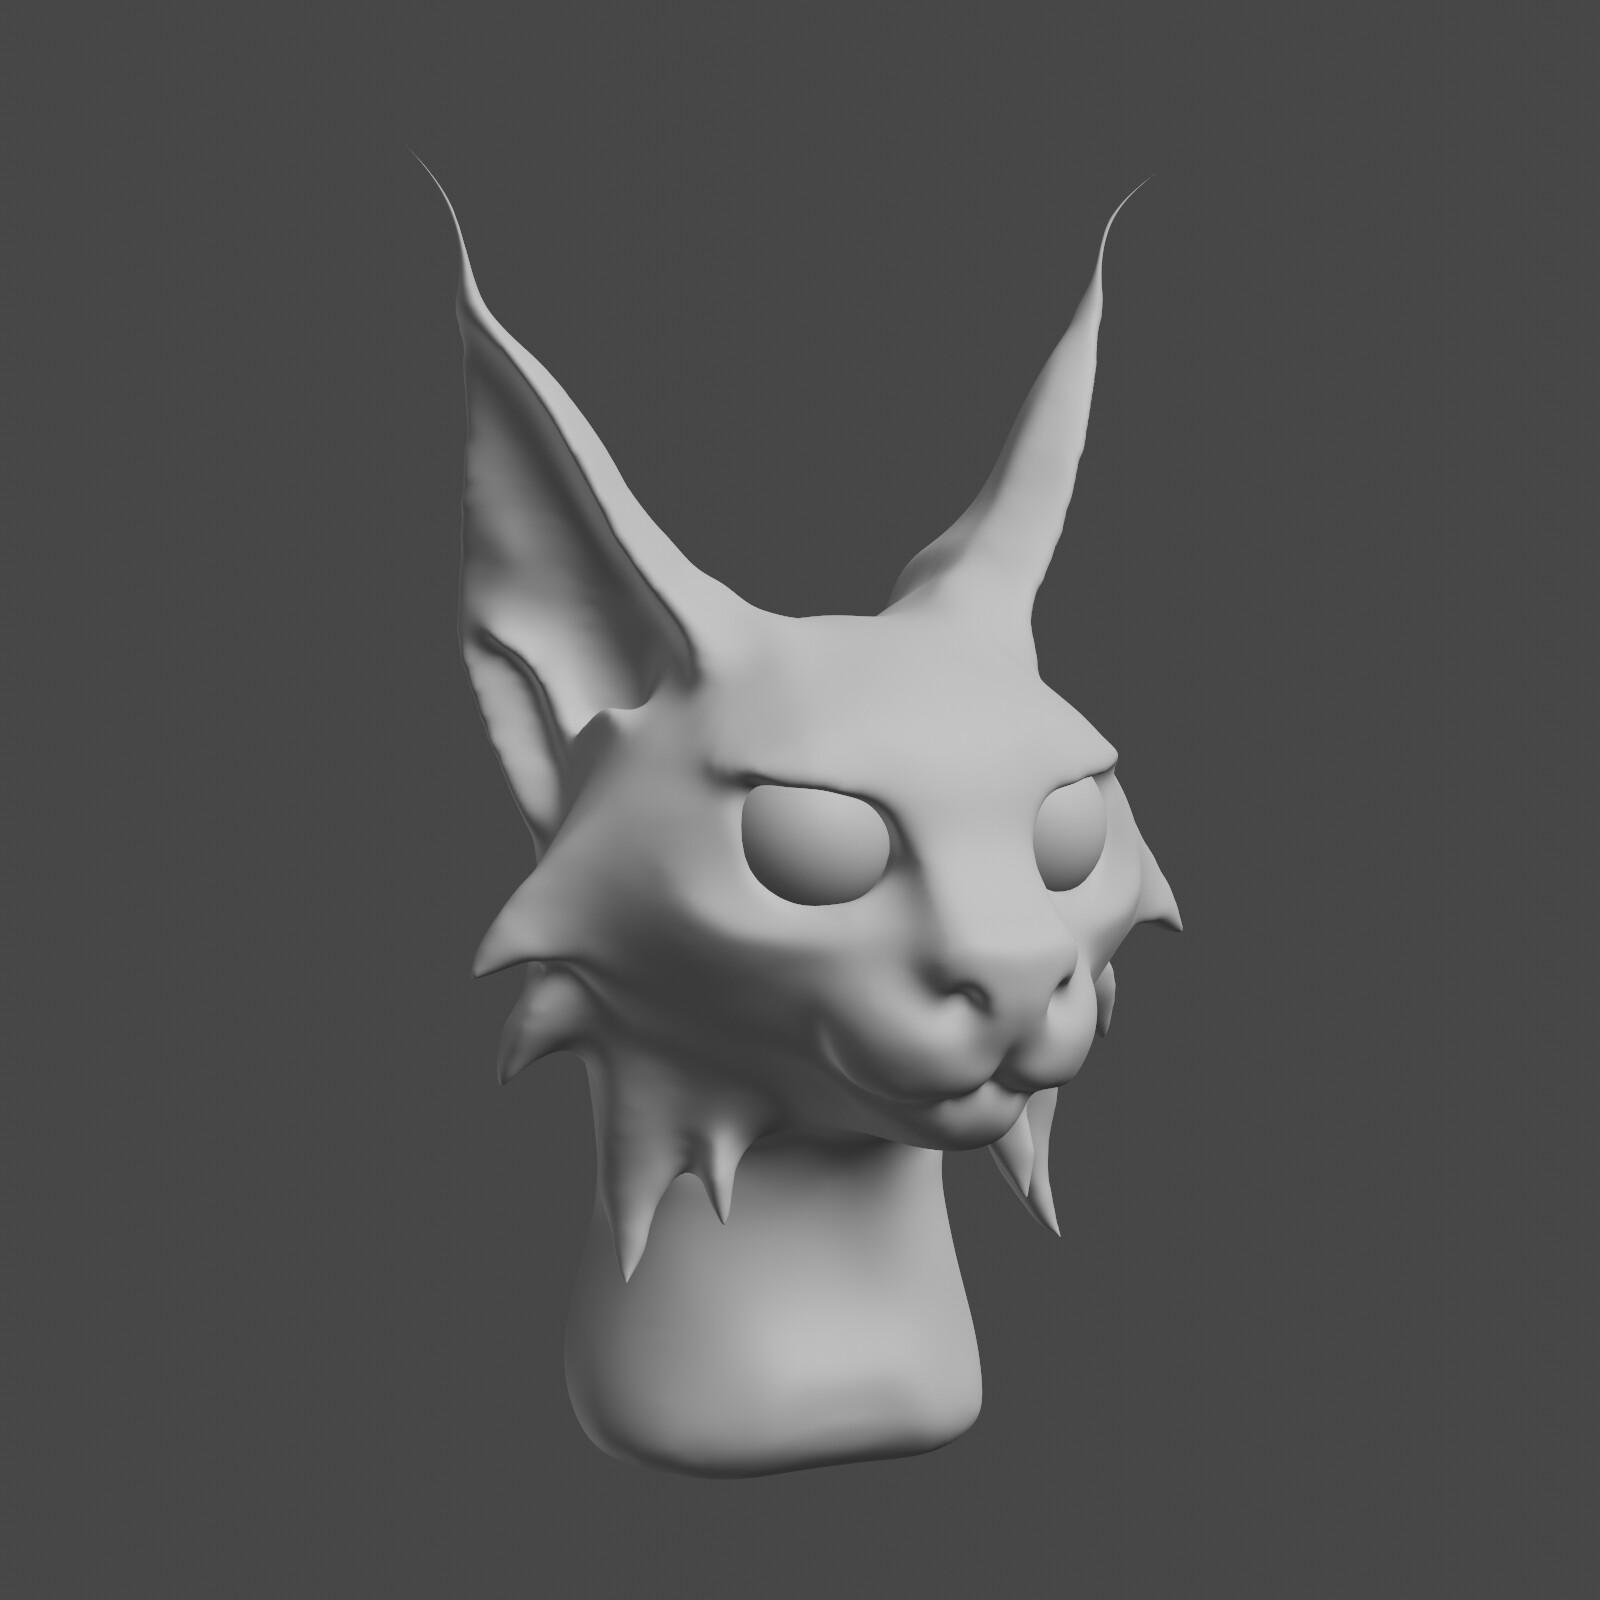 Base Sculpt